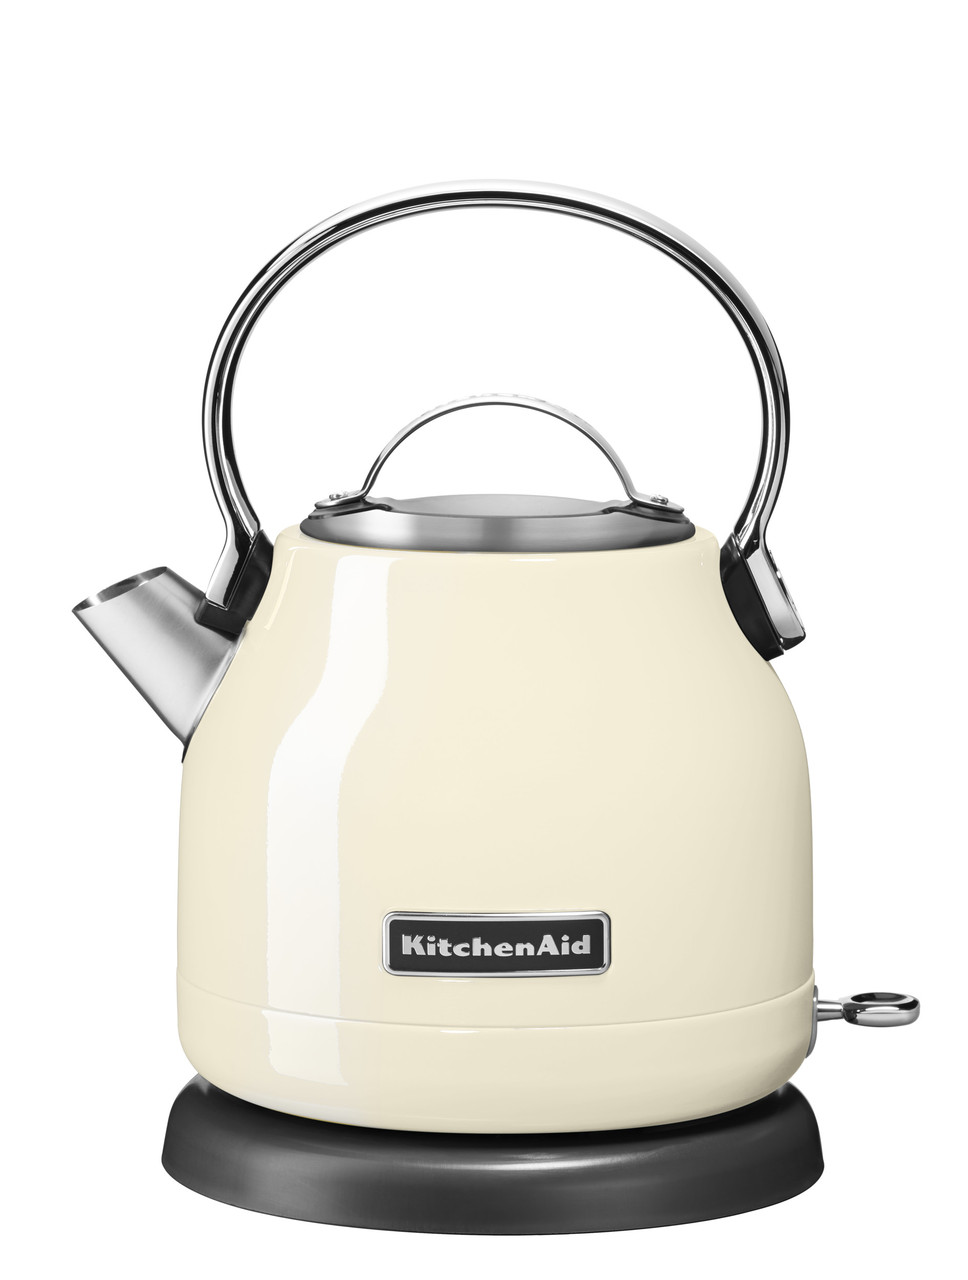 Чайник электрический с фильтром 1.25 л KitchenAid 1.25 L Water Kettle 5KEK1222EAC